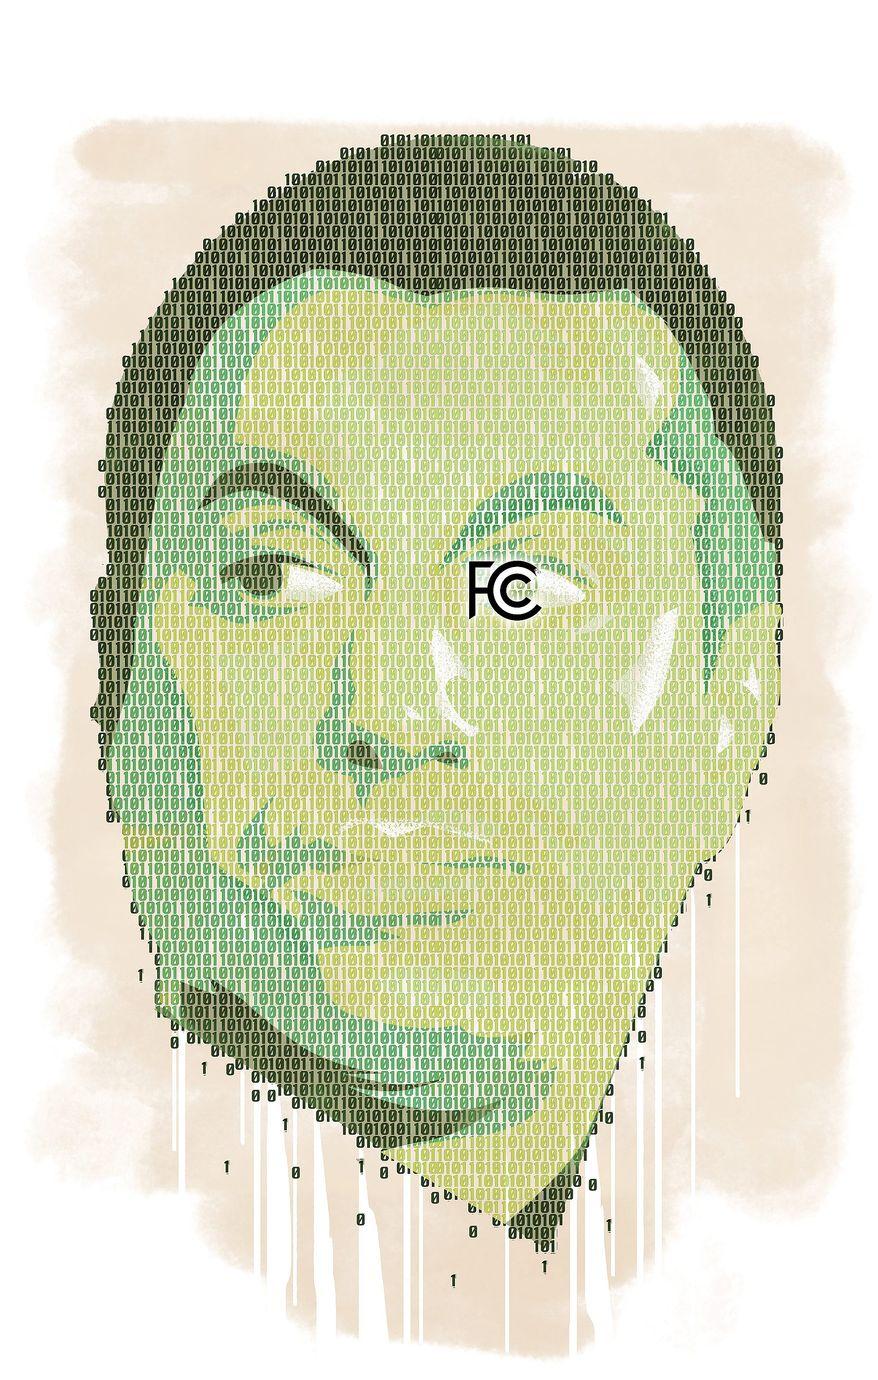 Illustration of Ajit Pai by Linas Garsys/The Washington Times